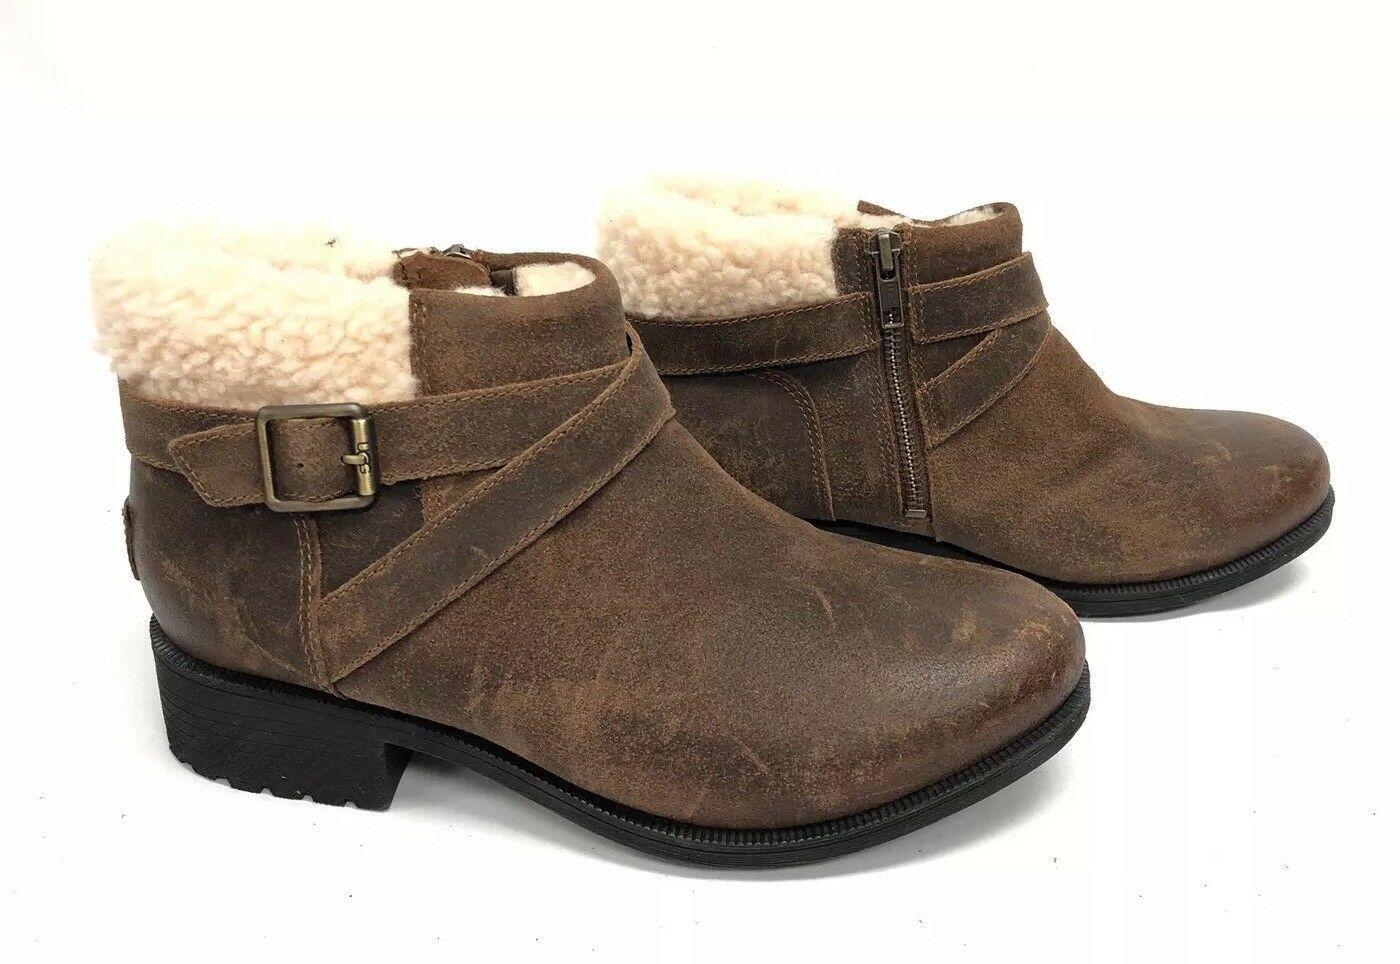 UGG Australia BENSON Buckle Sheepskin Ankle Booties 1095151 Chipmunk Waterproof